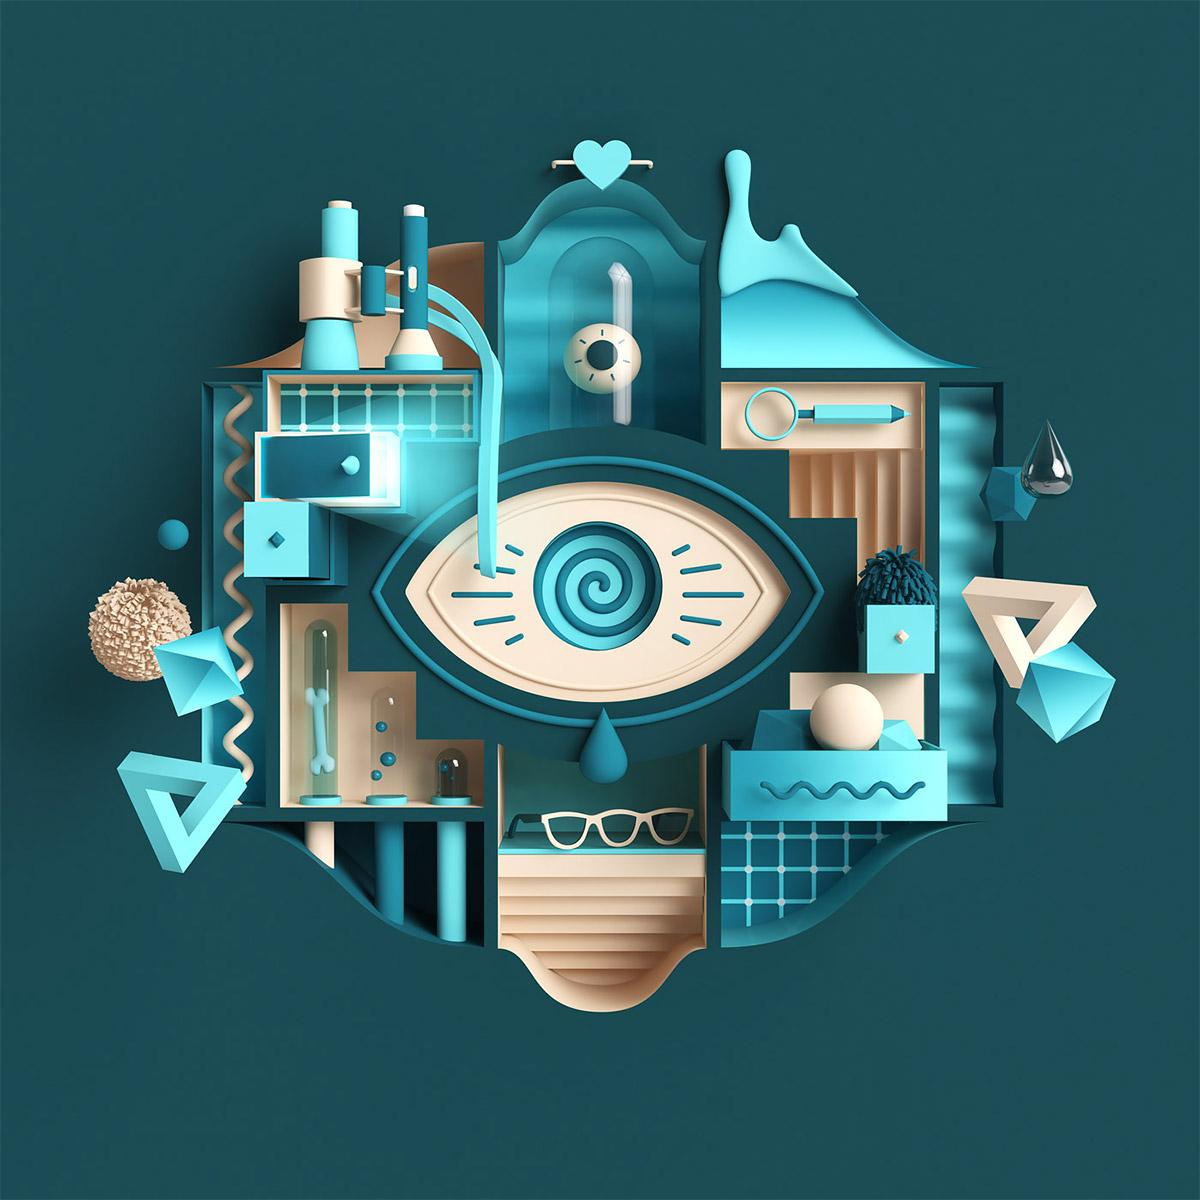 Vibrant Digital Illustrations by Rutger Paulusse